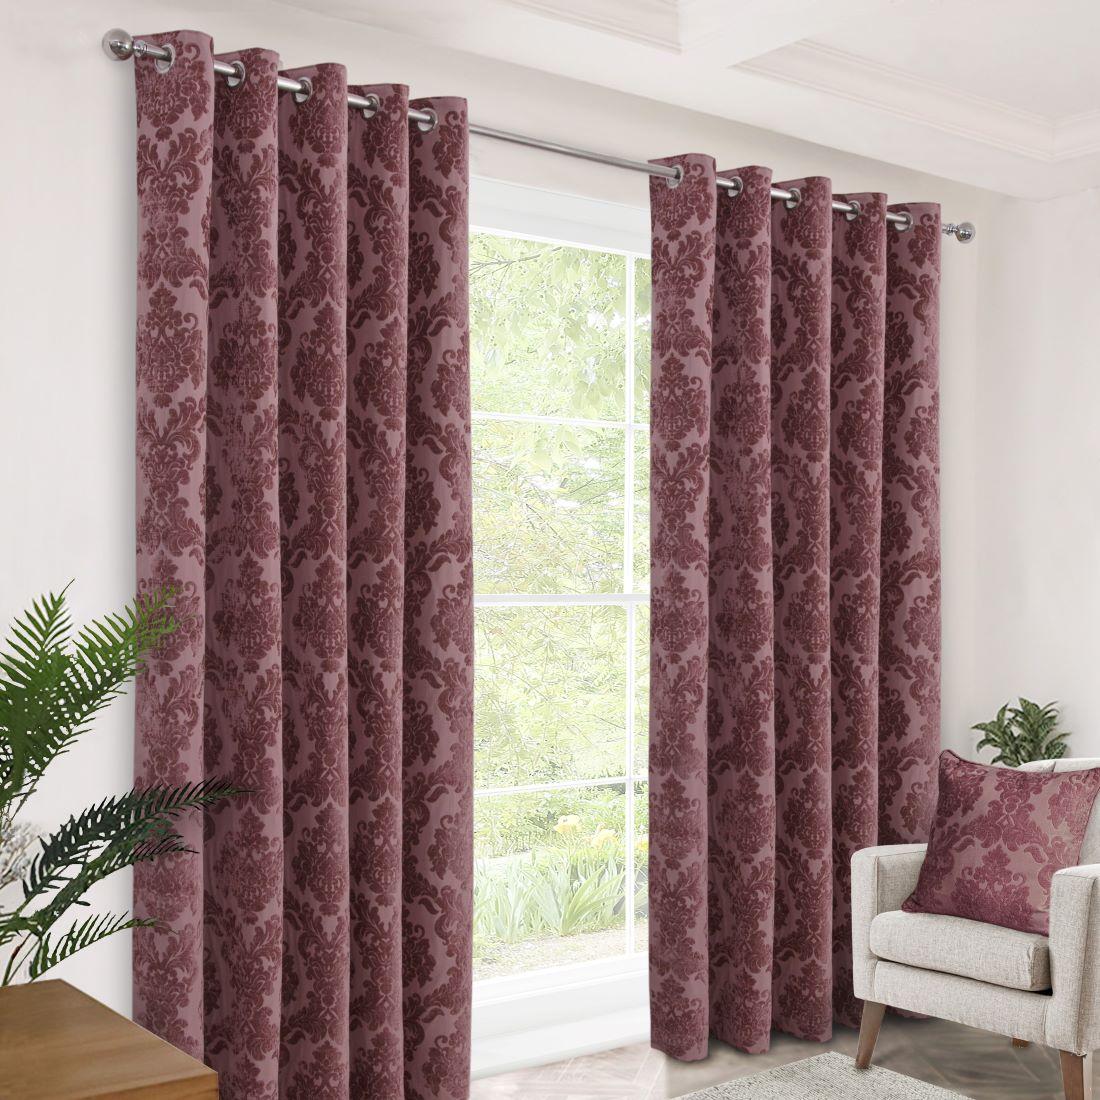 Merrion Old Rose Eyelet Curtains